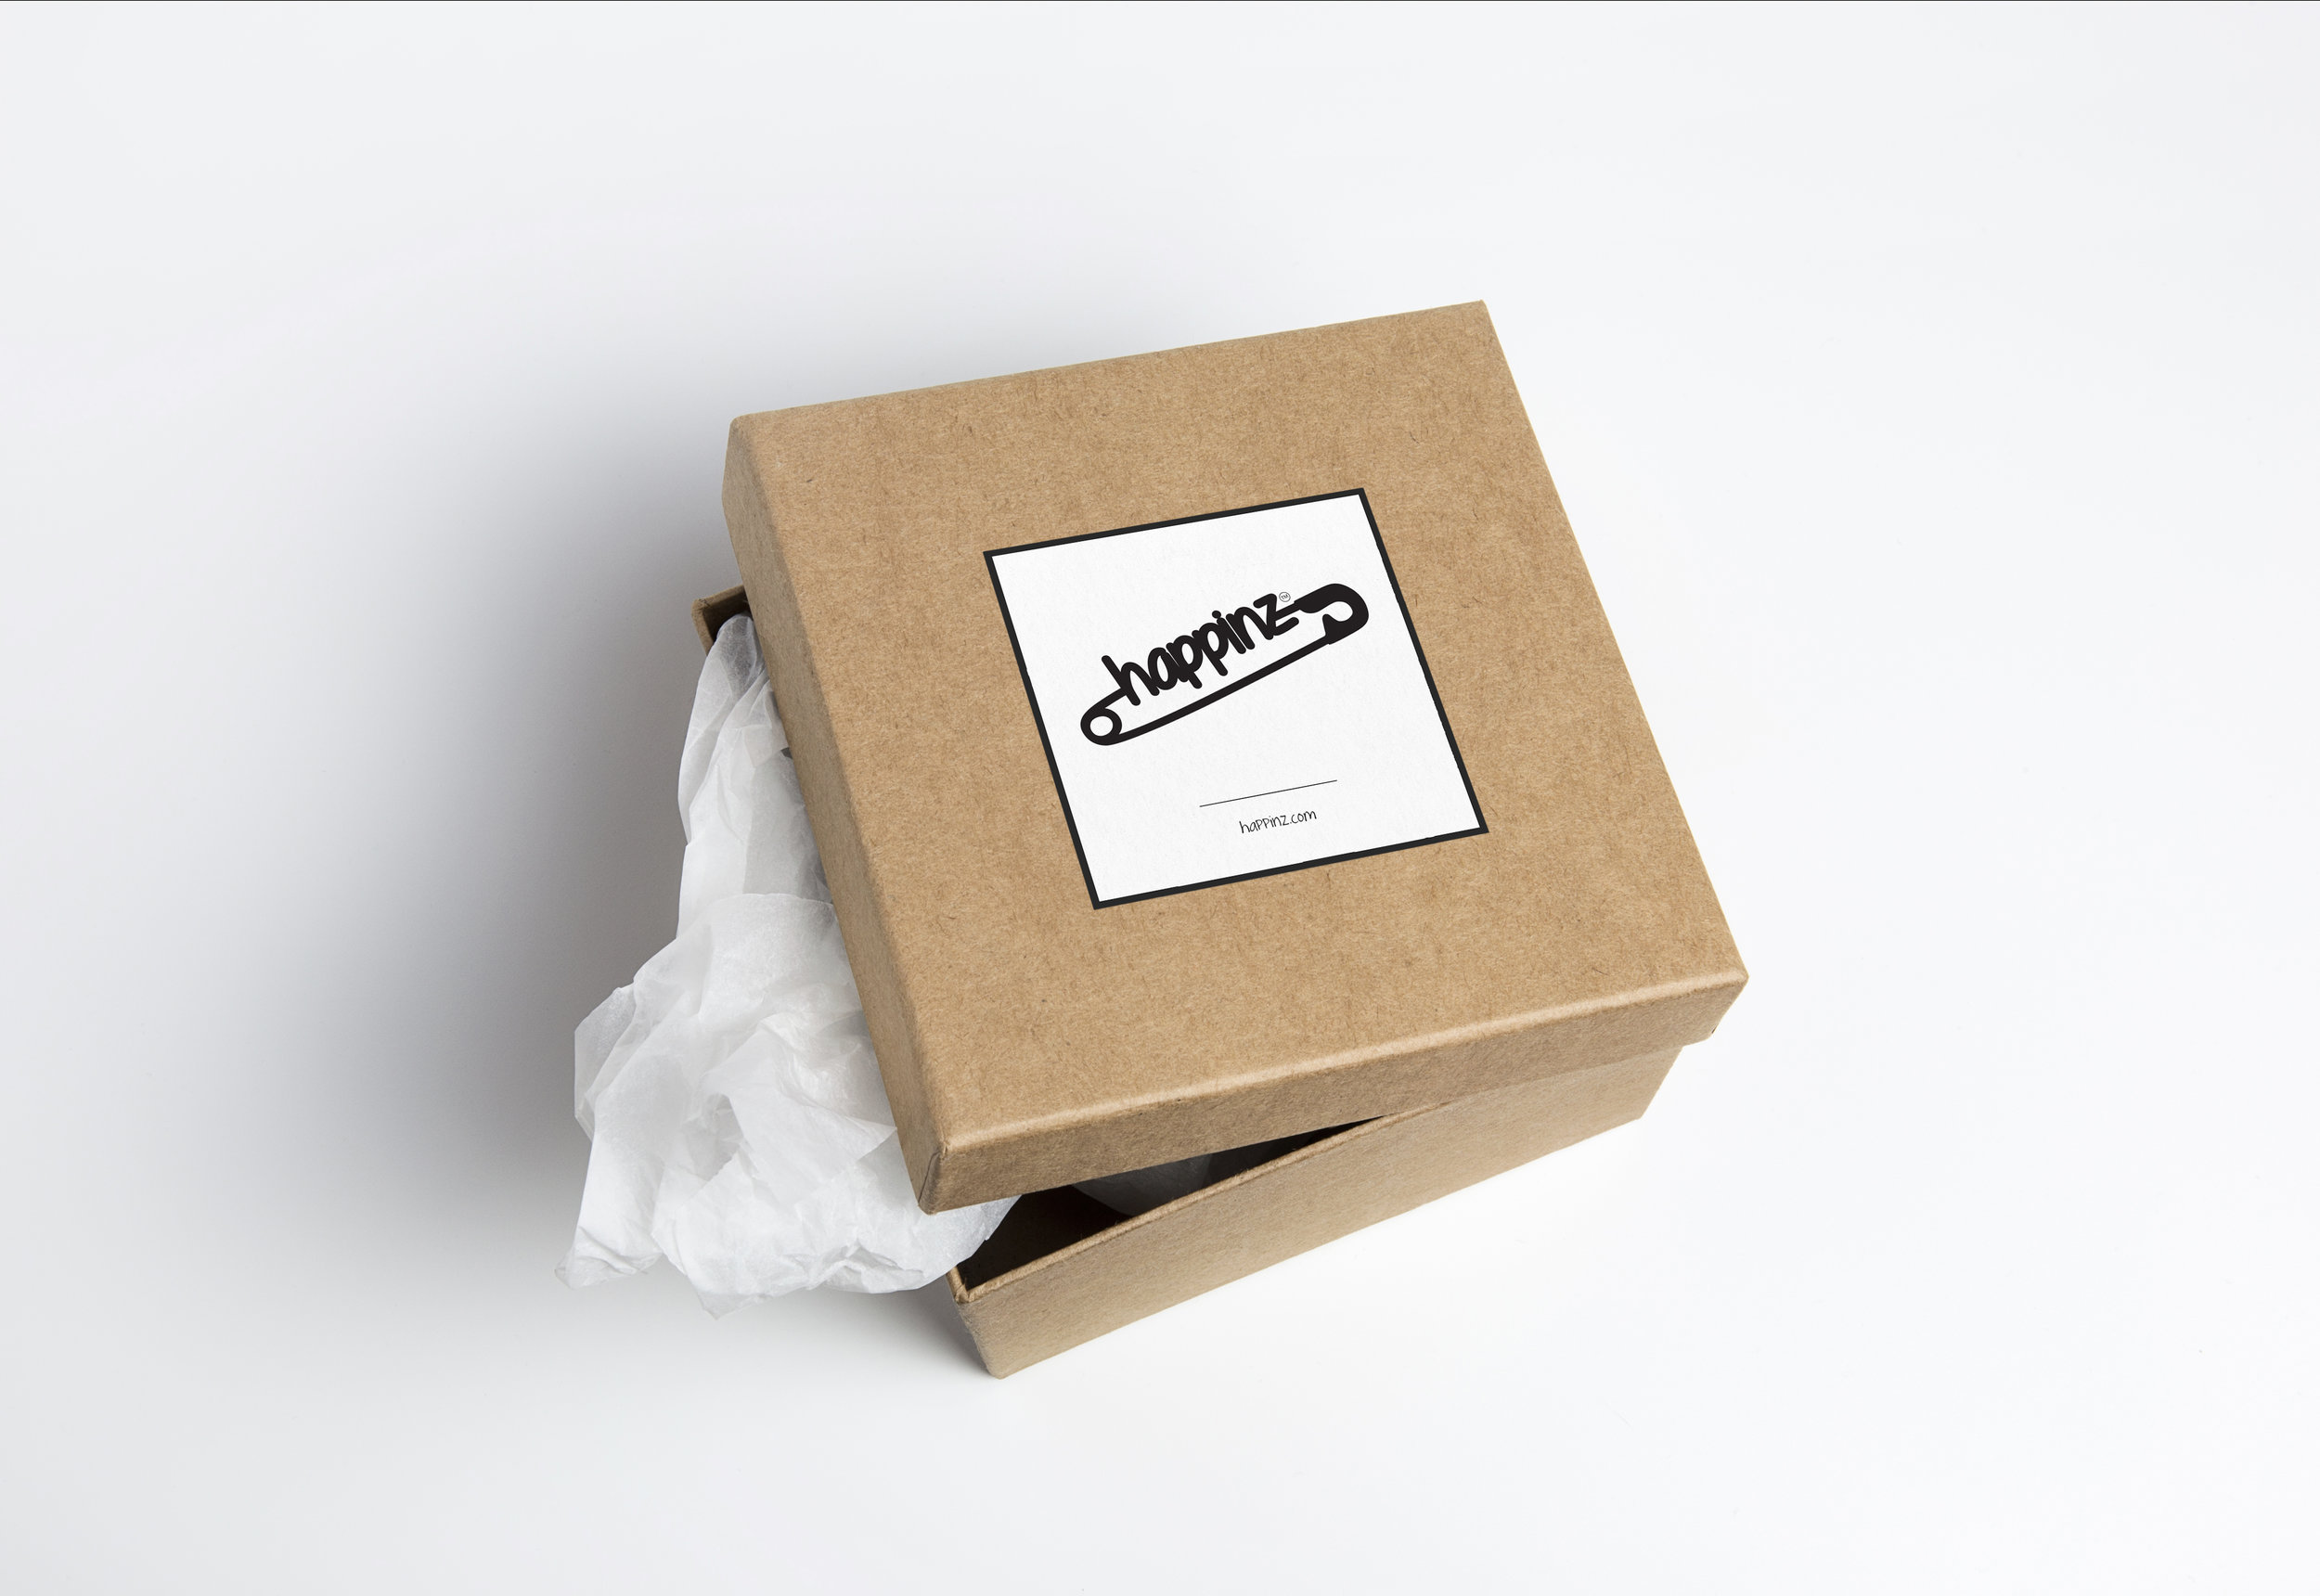 hap-box-1.jpg